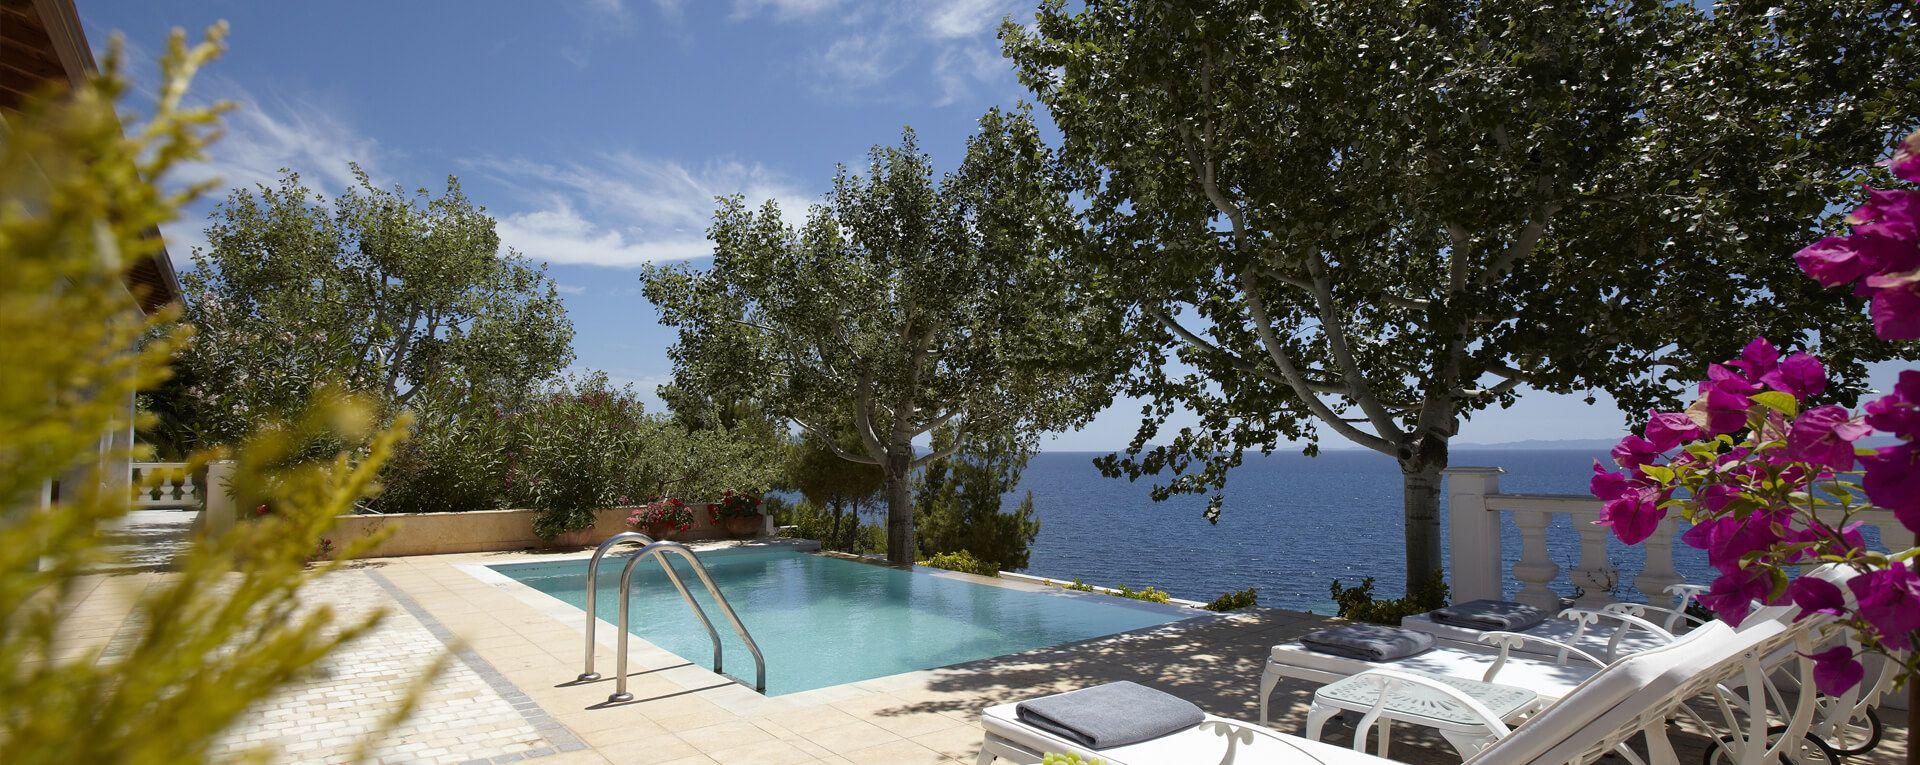 Danai Beach Resort & Villas, Halkidiki